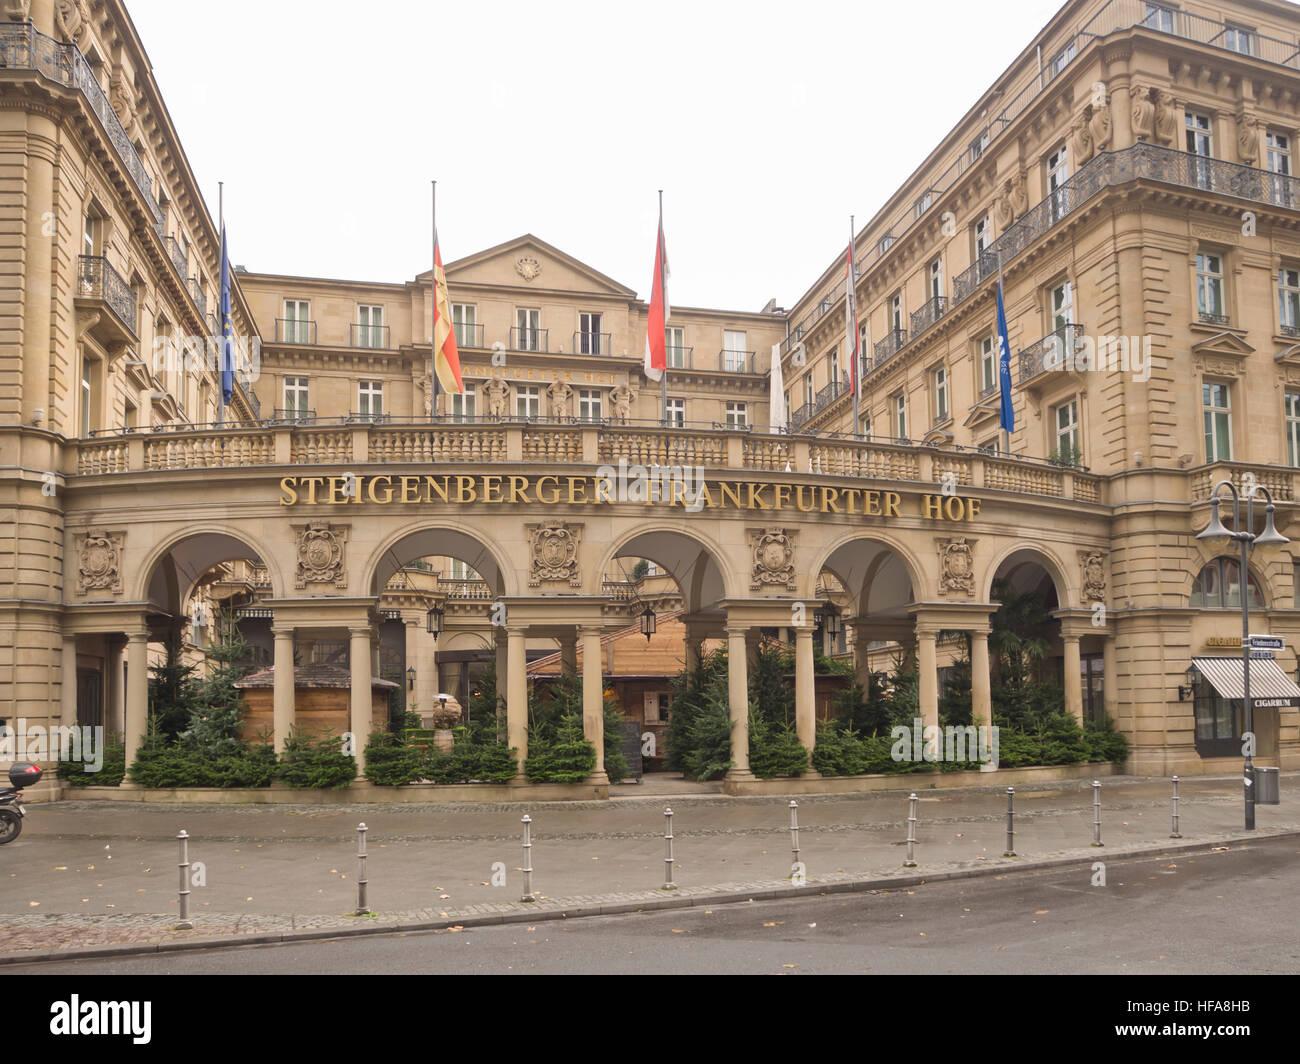 Steigenberger Frankfurter Hof Luxury Hotel Accommodation In